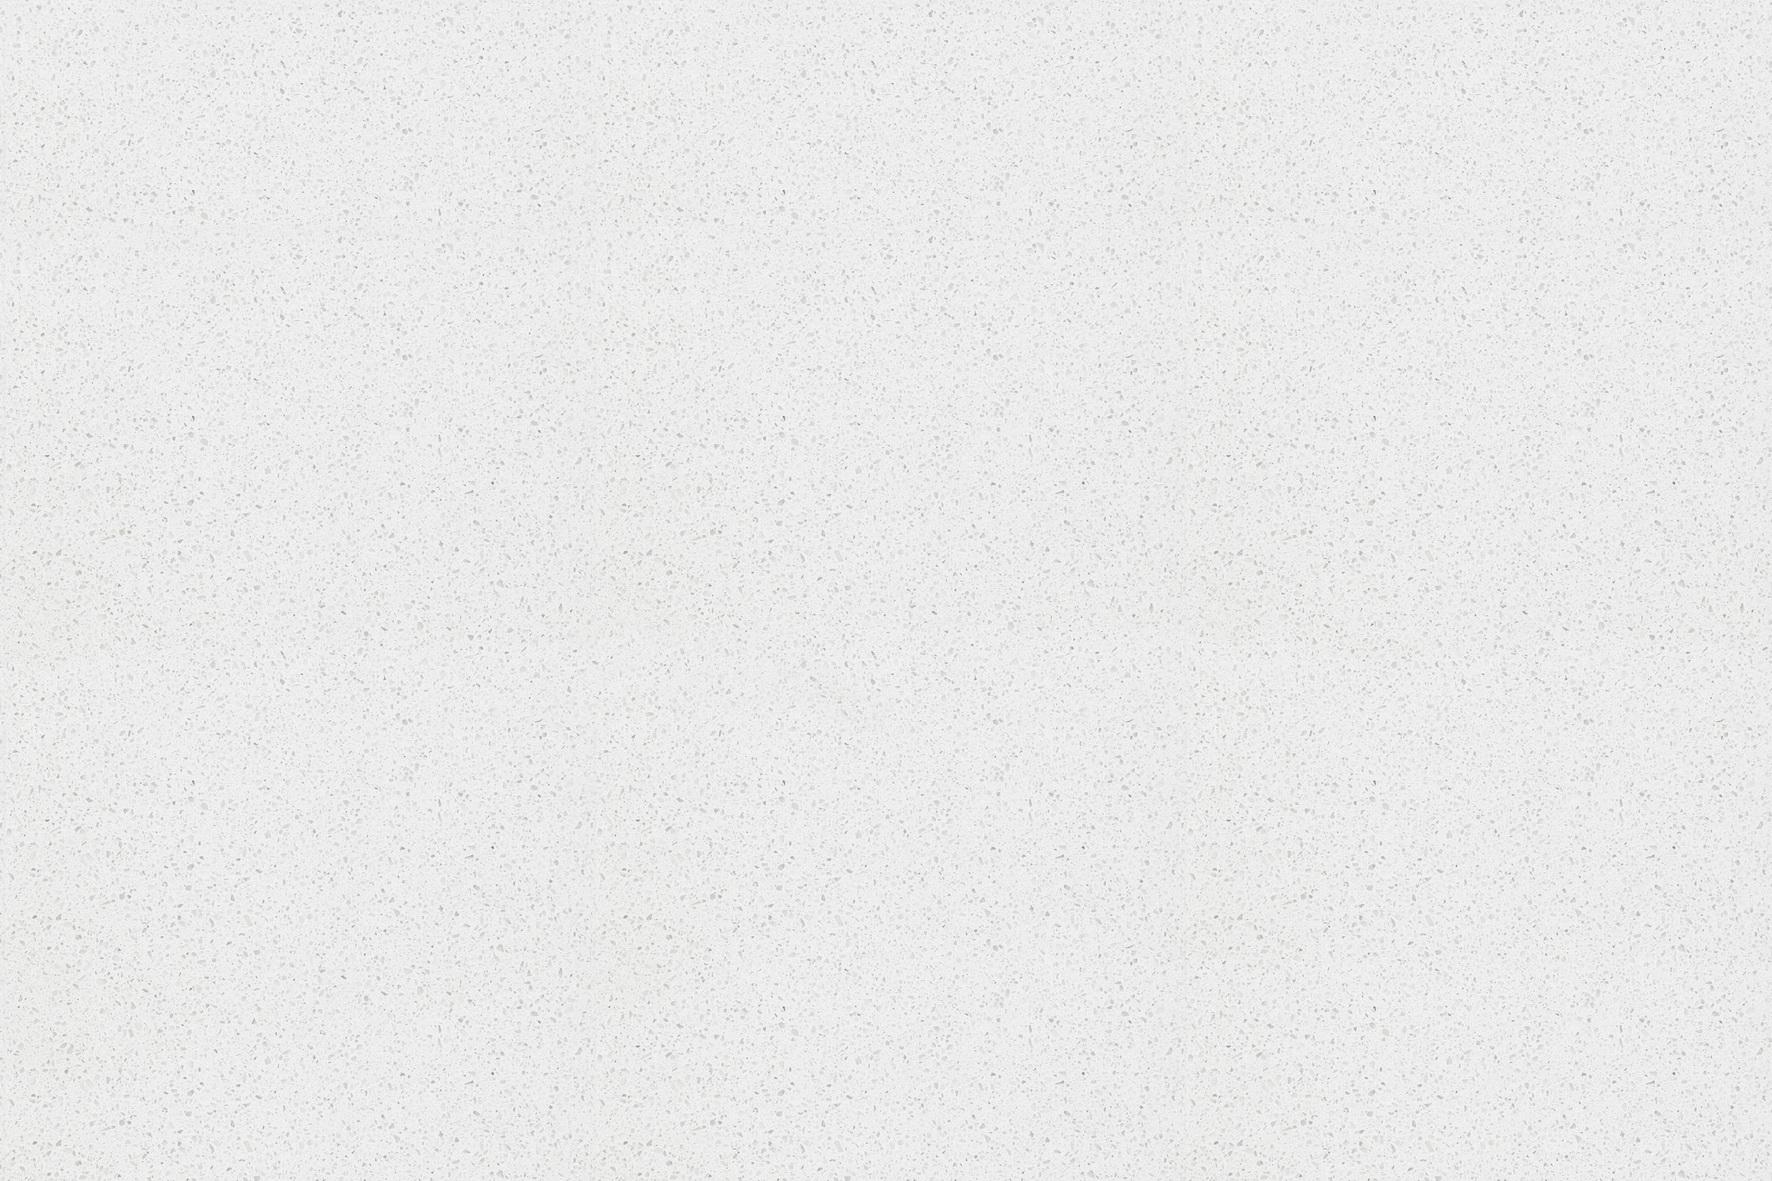 ARCTIC WHITE-UNIPLUS - BUSH-HAMMERED Foto: 1_58338_37608.jpg